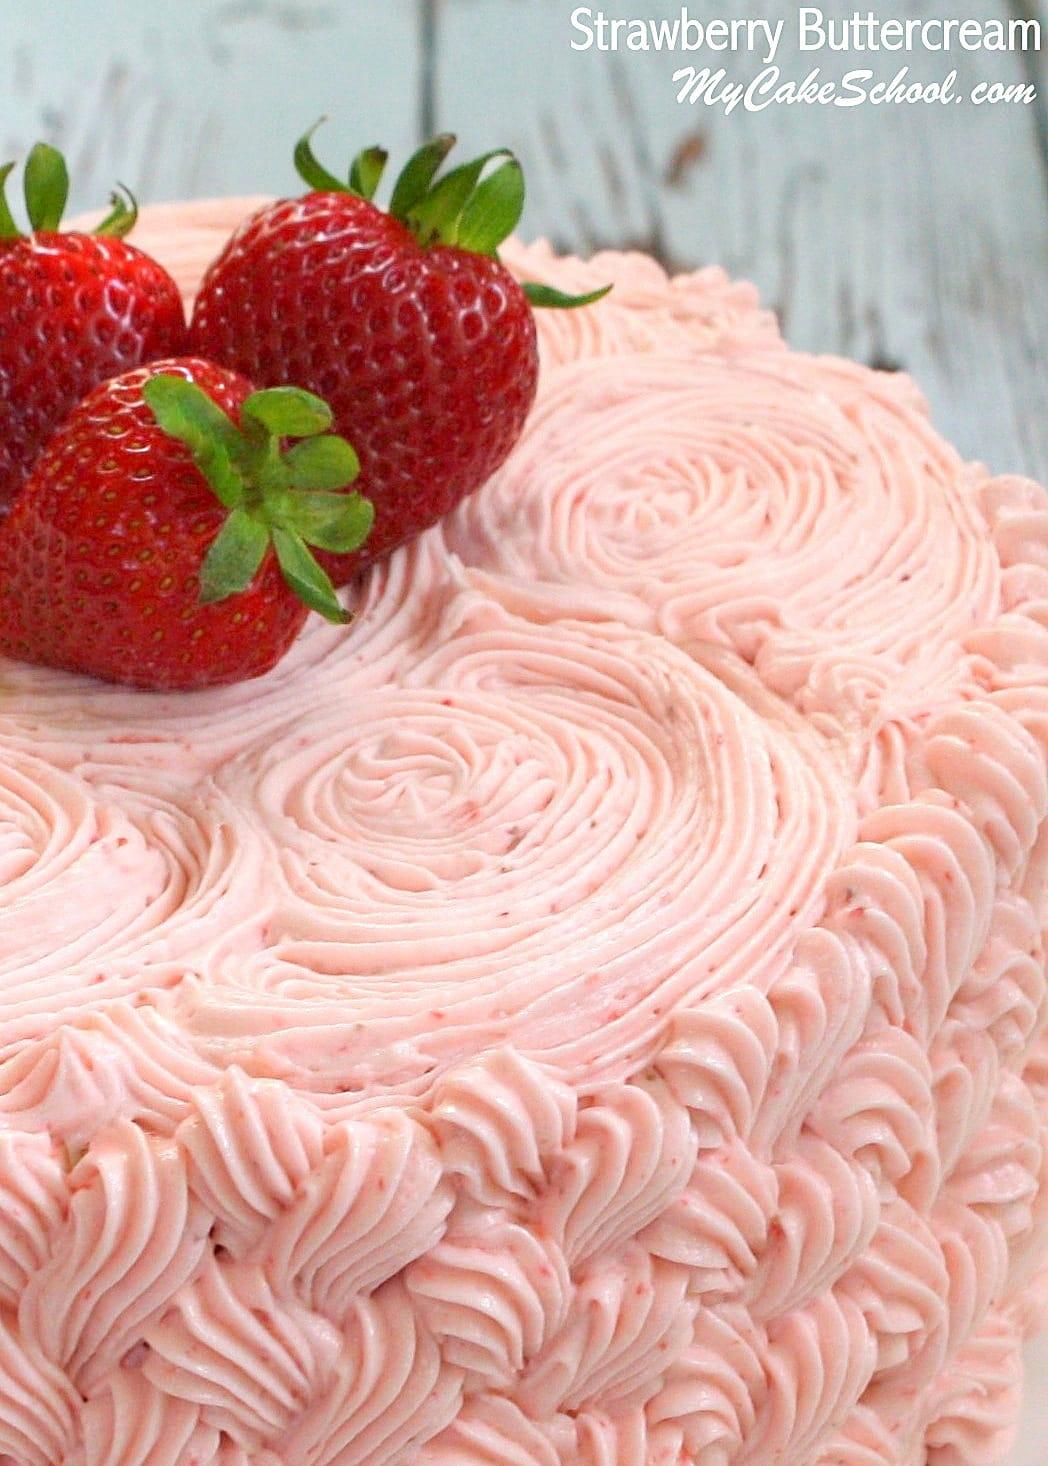 Strawberry Buttercream Frosting | My Cake School